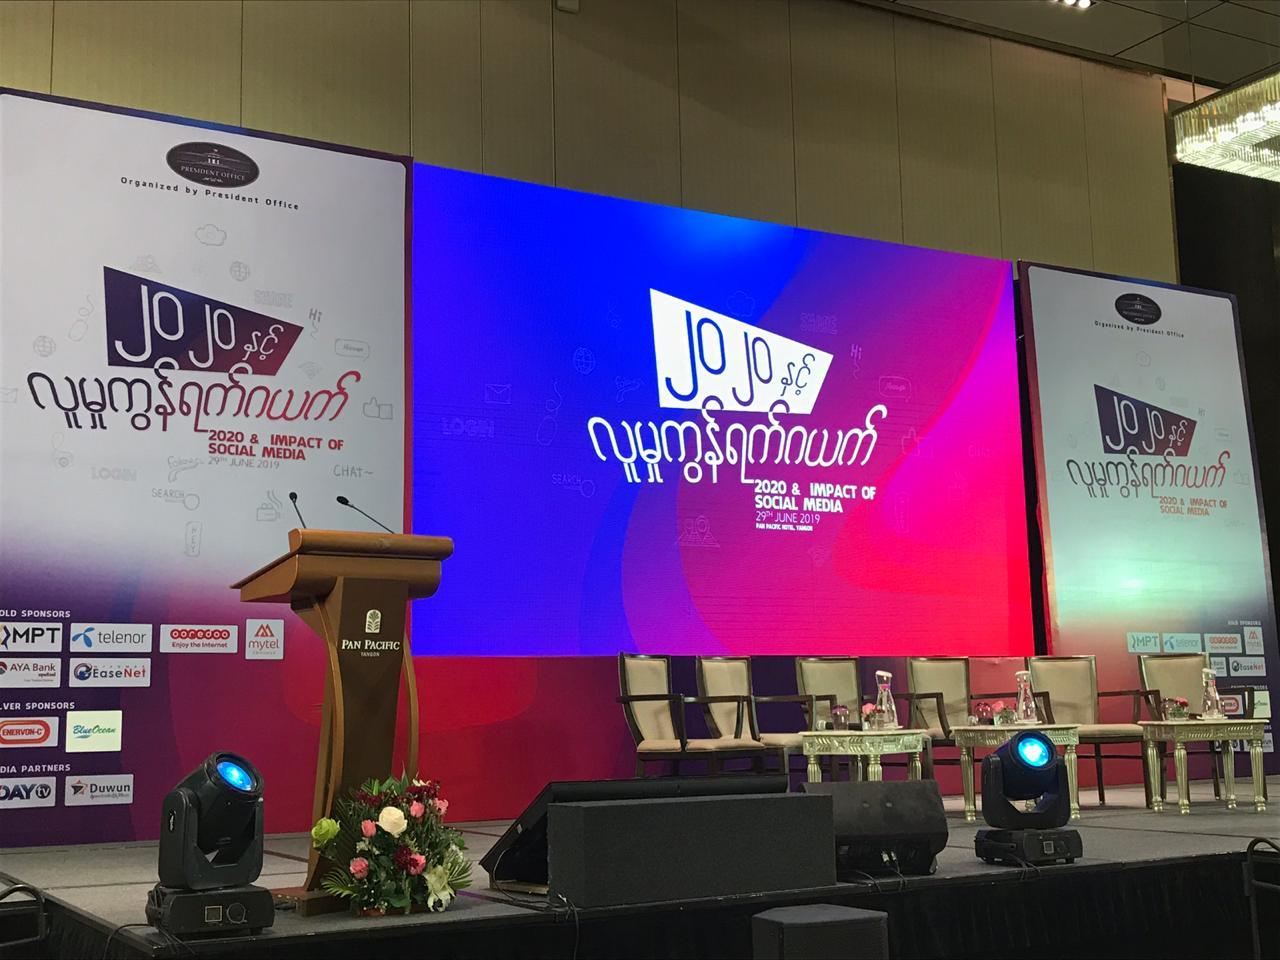 2020 & Impact of Social Media Forum-2019  organized by President's Office in Yangon on June 29.